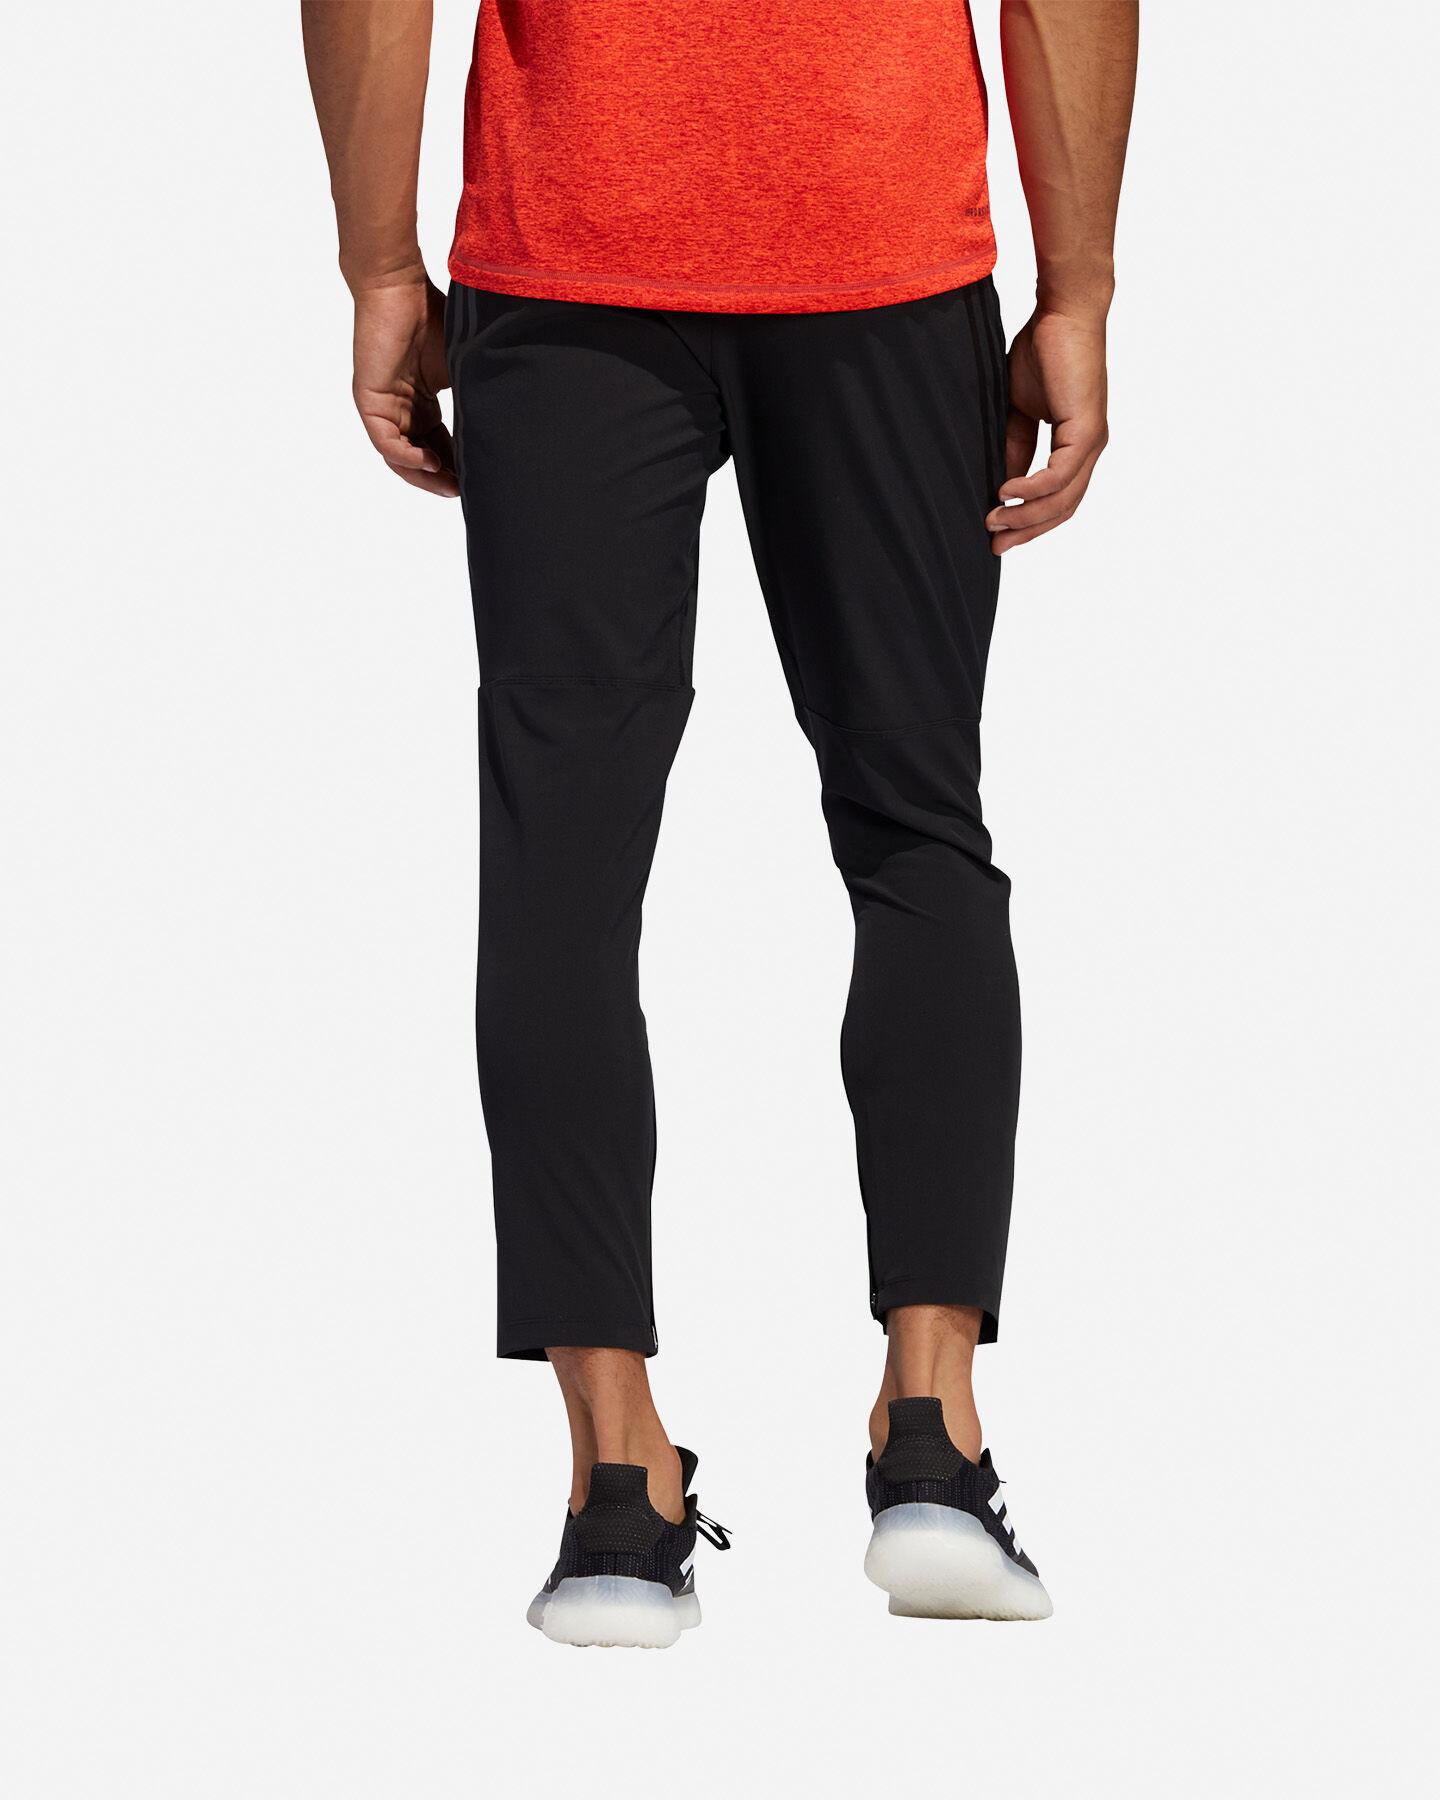 Pantalone training ADIDAS AEROREADY 3-STRIPES M S5154644 scatto 4